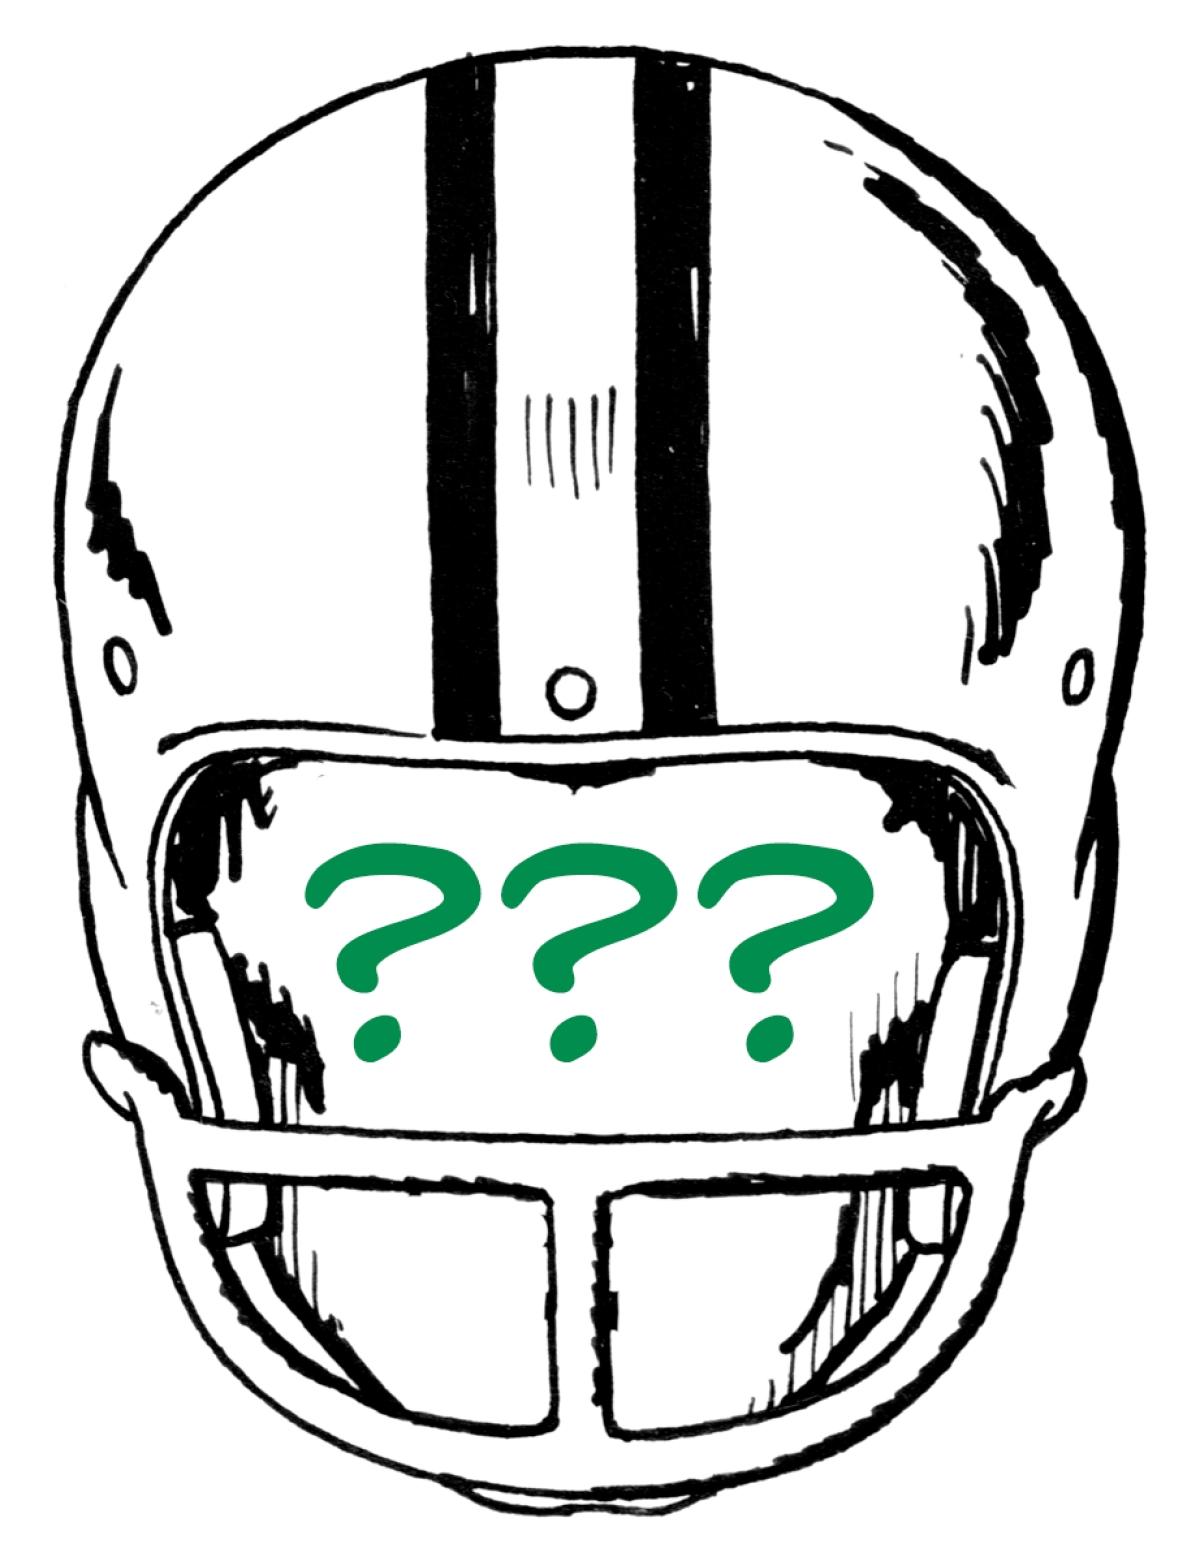 The NFL Degenerate